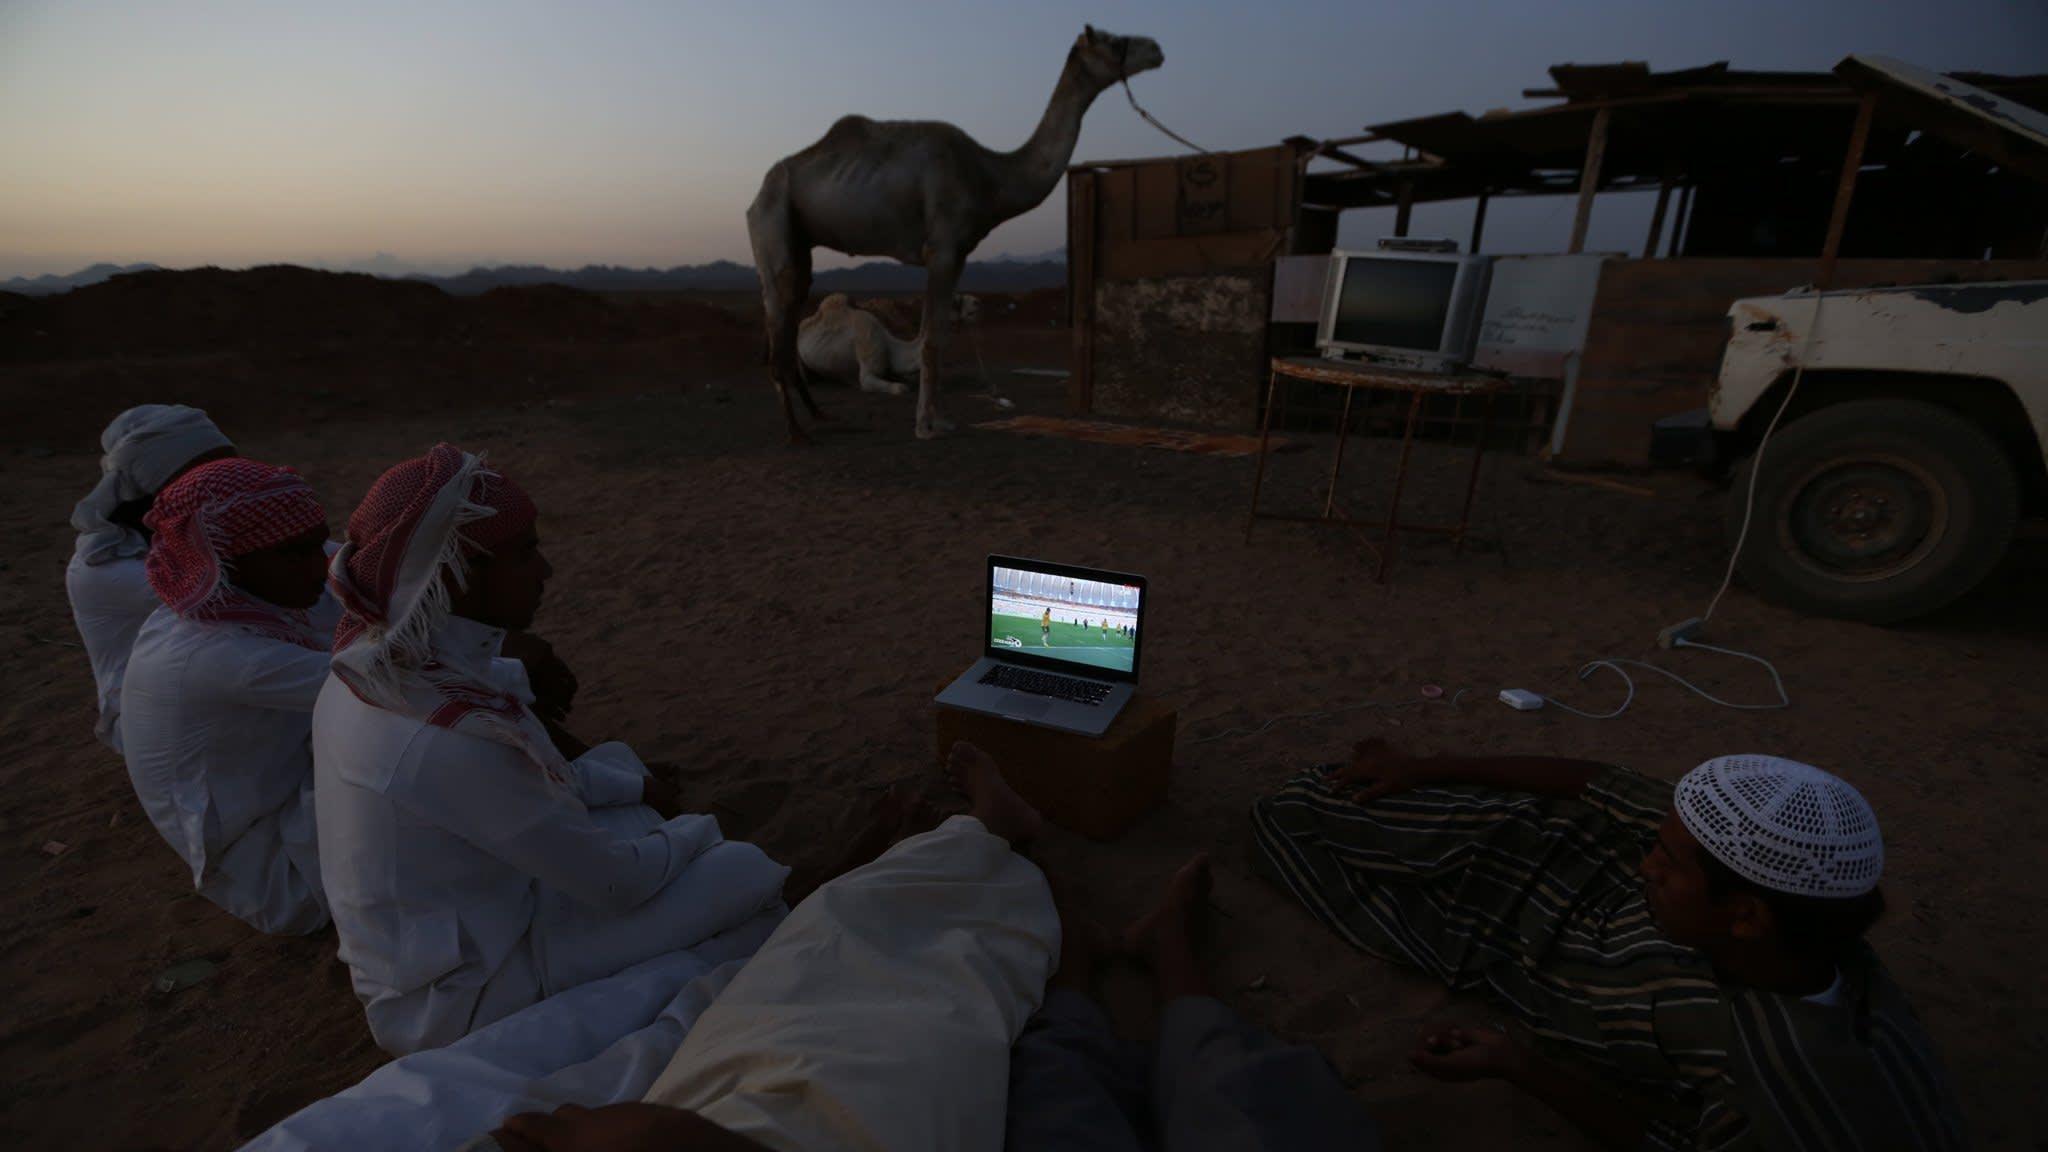 Pirated TV sport emerges as new Gulf battleground